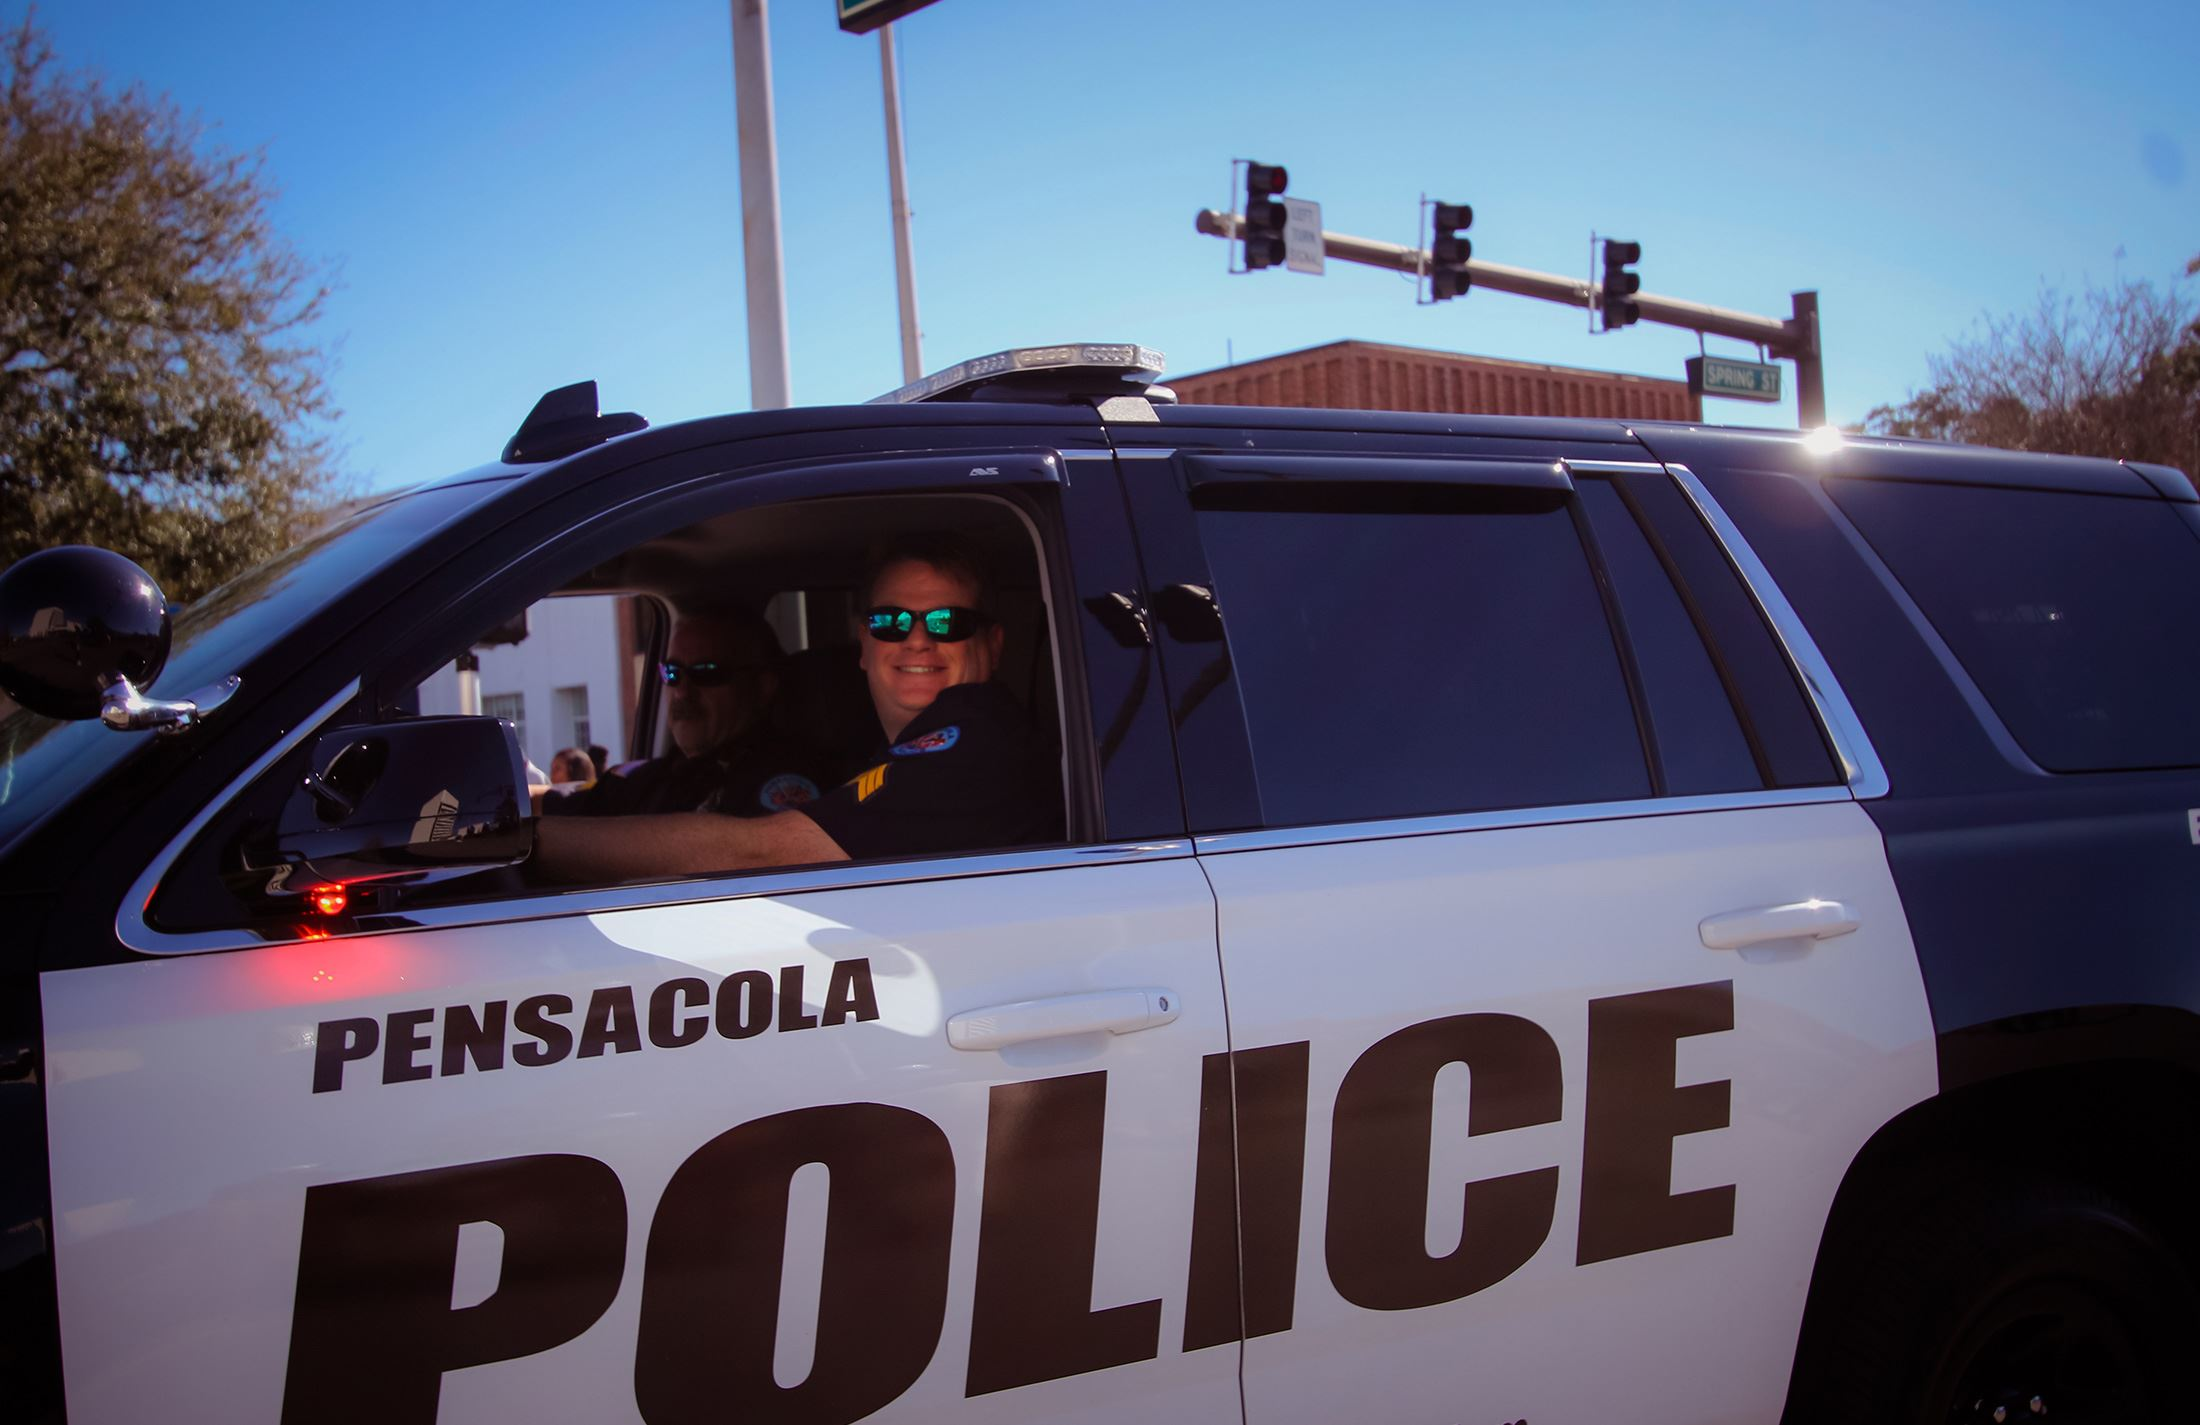 Department Of Motor Vehicles Pensacola - impremedia.net